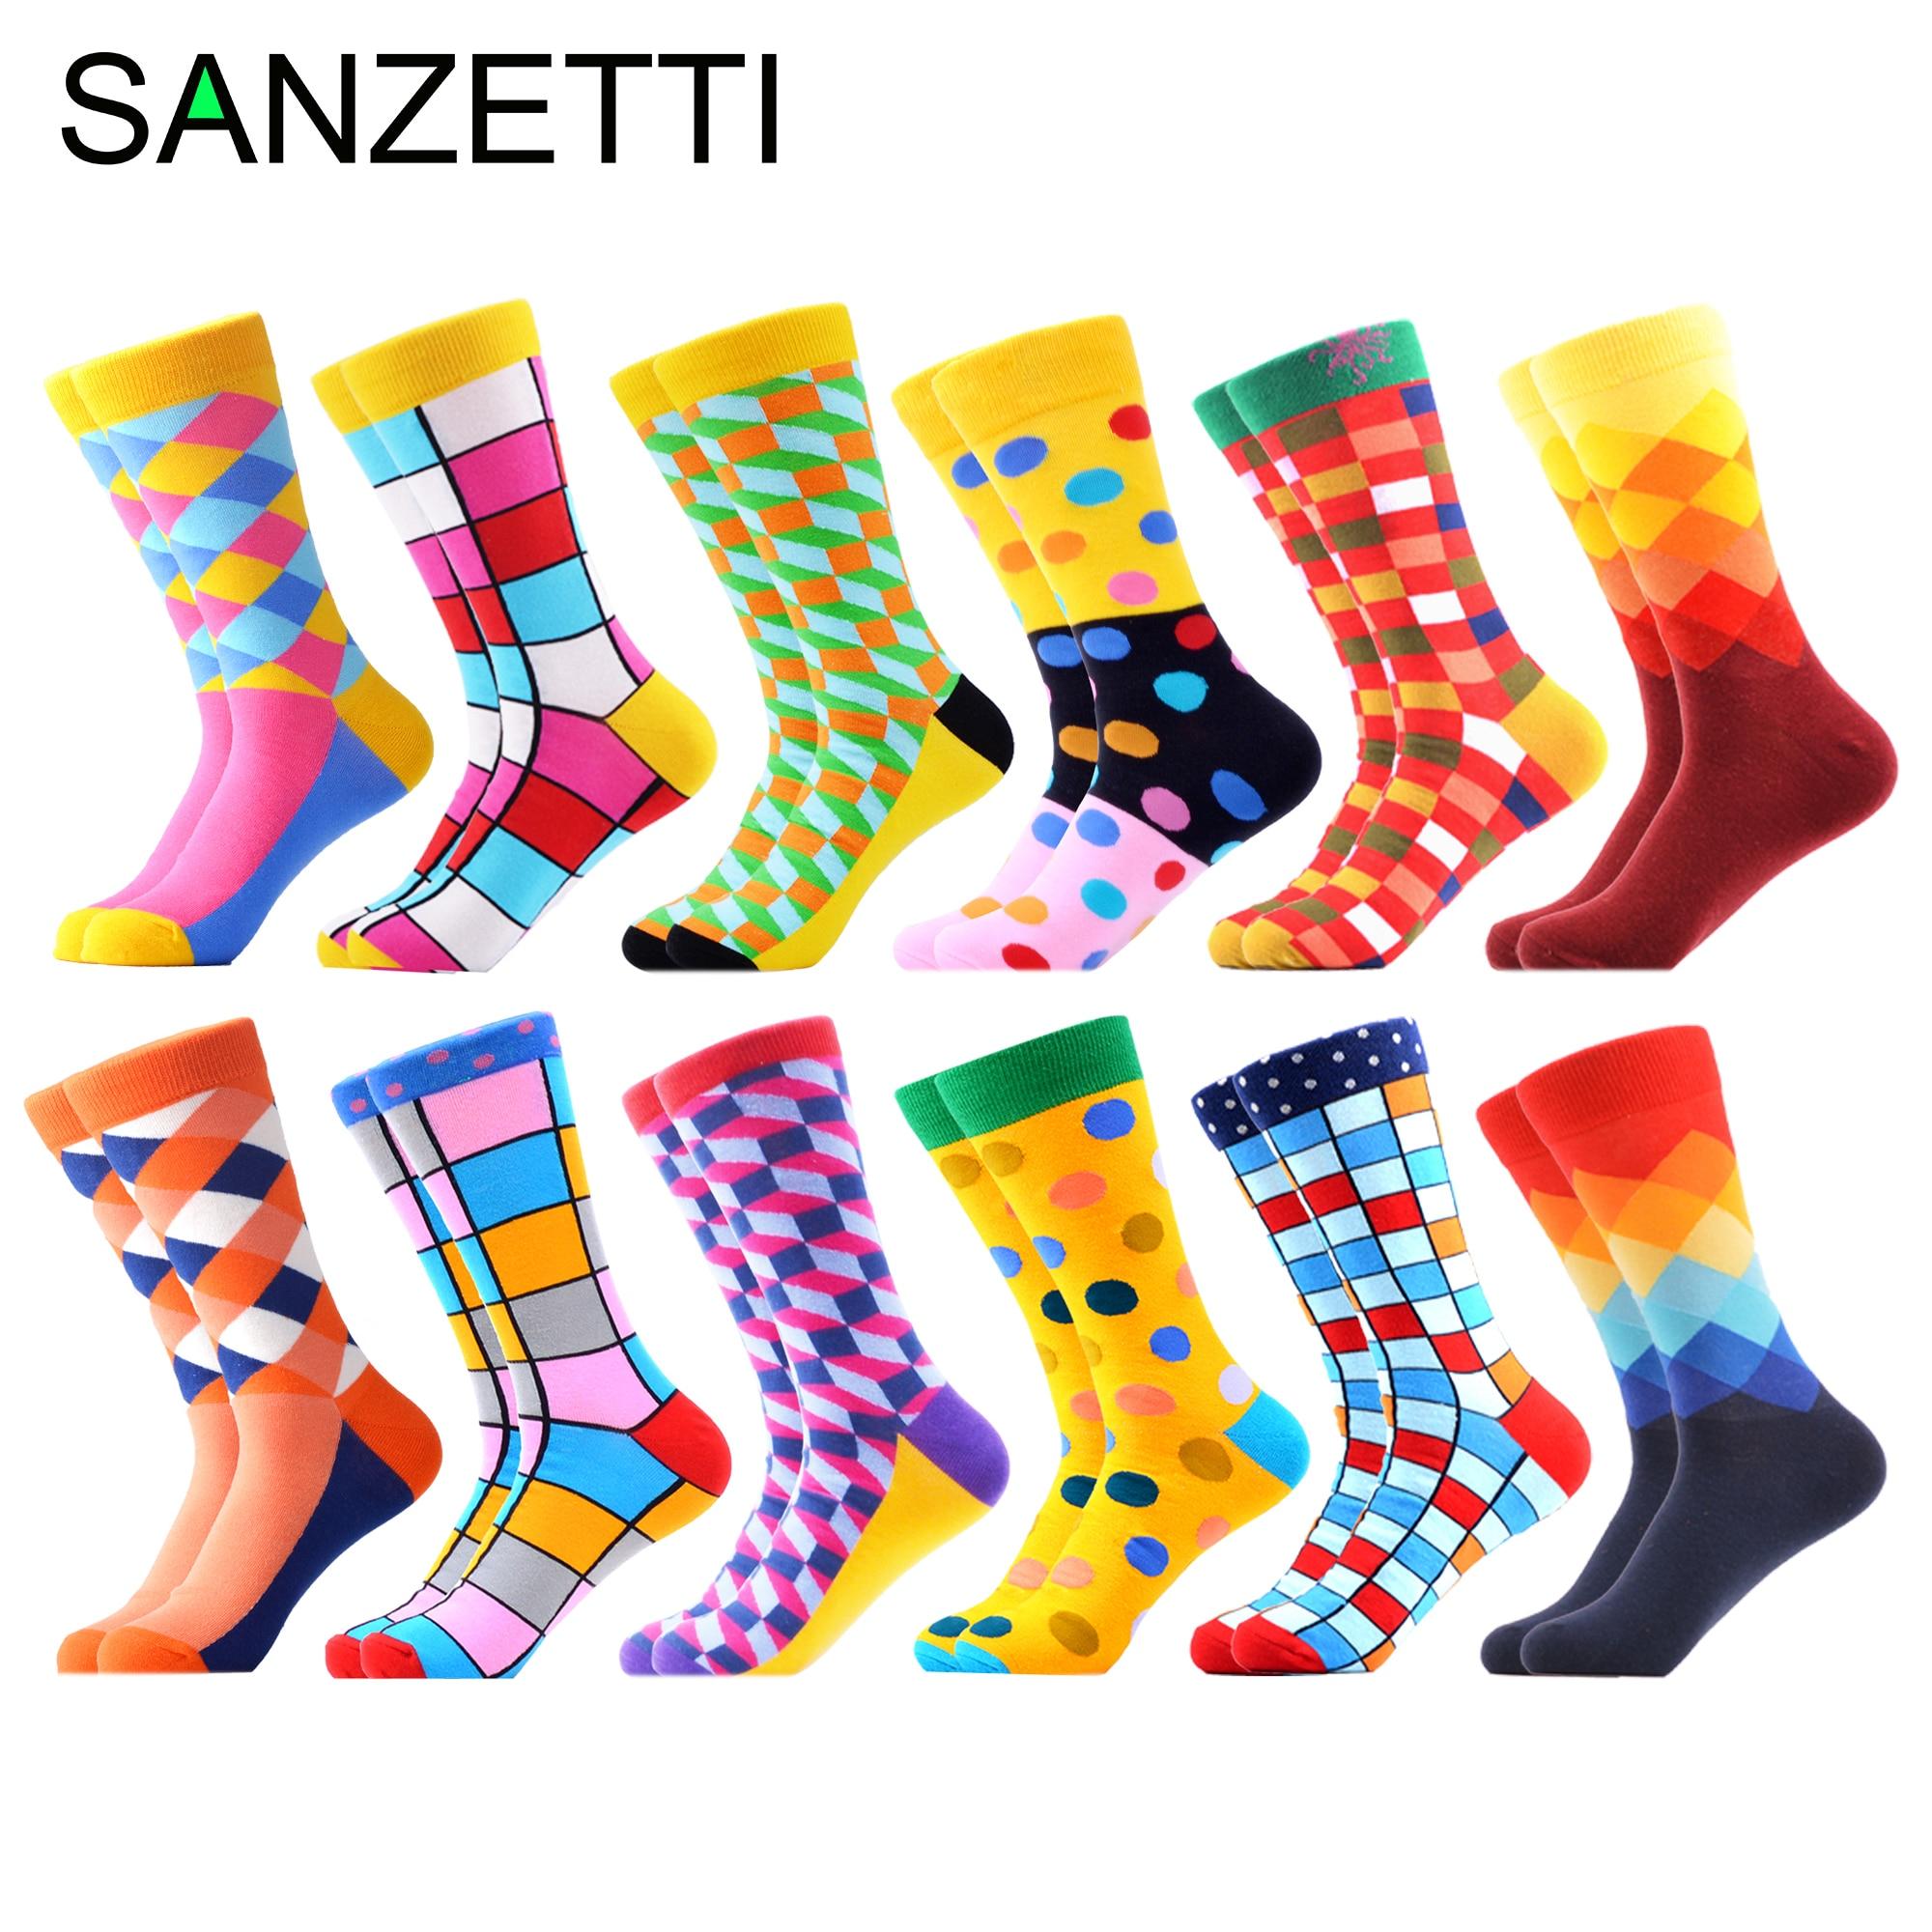 SANZETTI 12 Pairs/Lot Men's Colorful Socks Combed Cotton Socks Wedding Novelty Multi Happy Dress Socks Casual Design Crew Socks